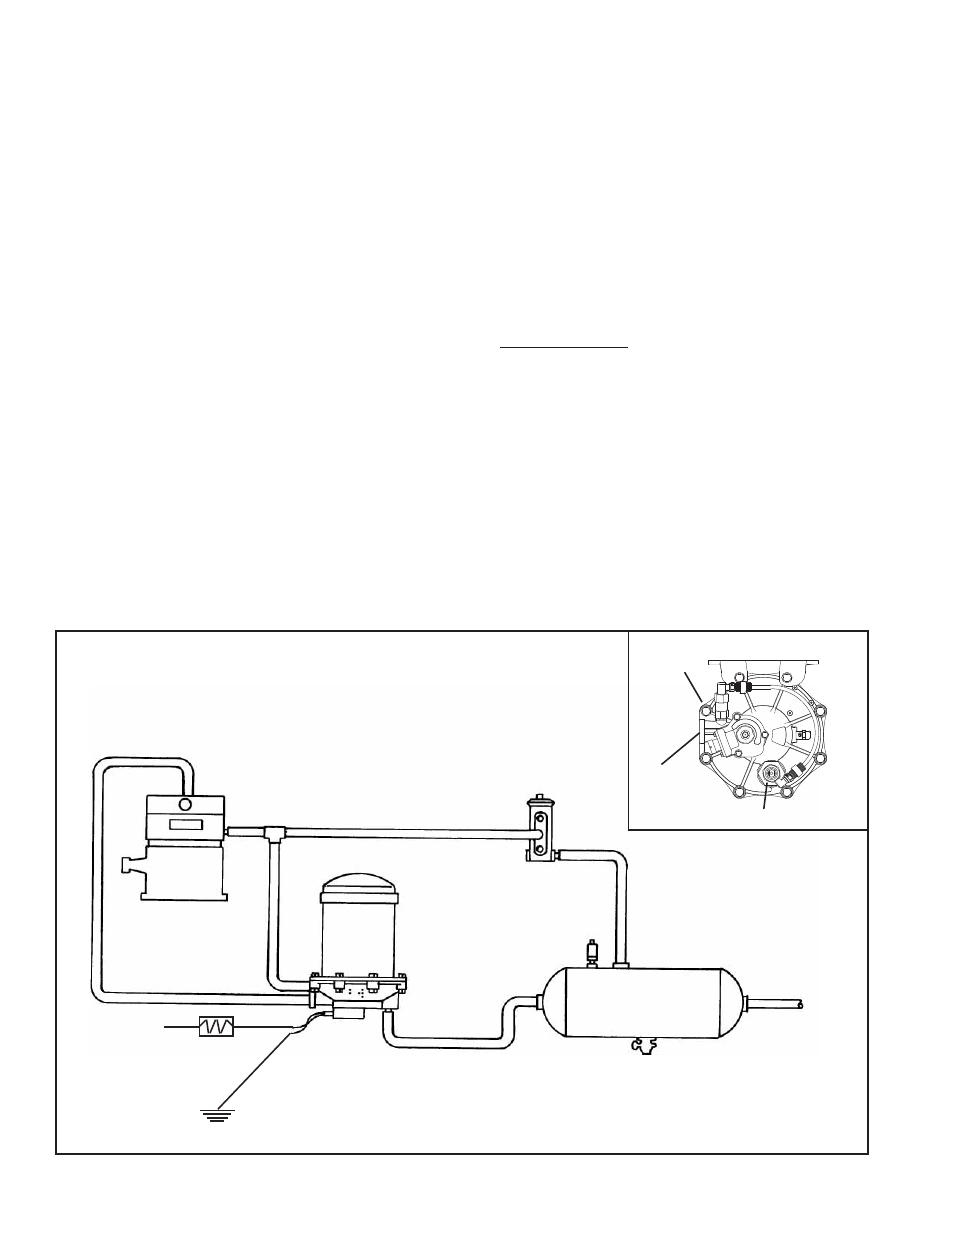 Ad Wiring Diagram